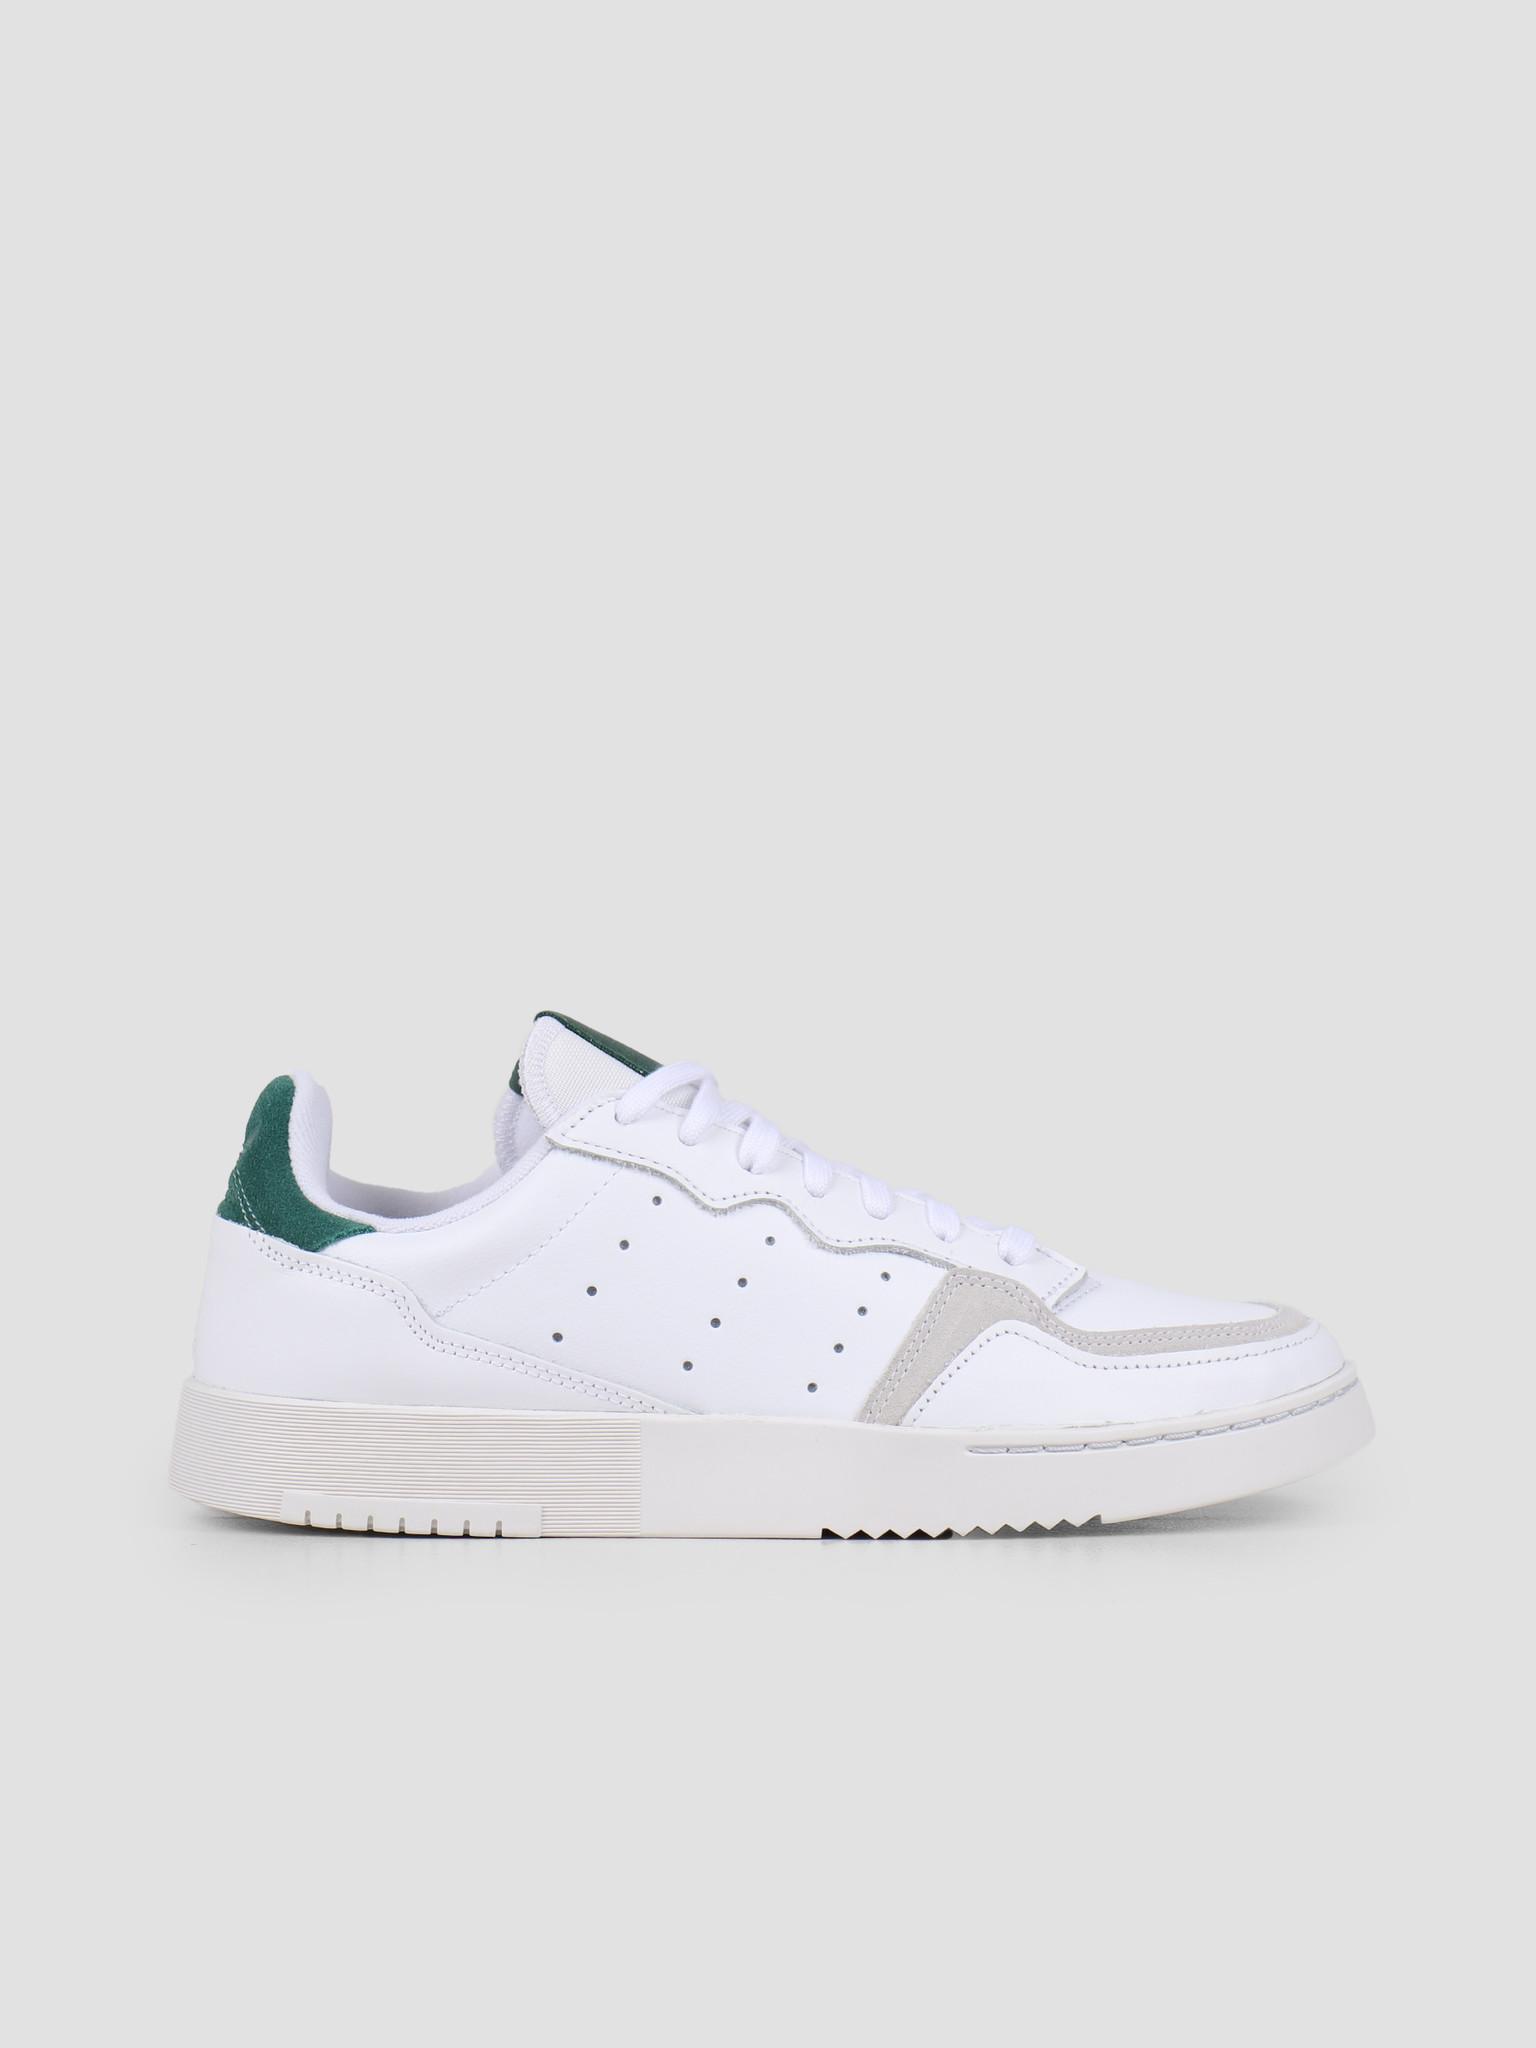 adidas Supercourt Footwear White Footwear White Collegiate Green EF5884